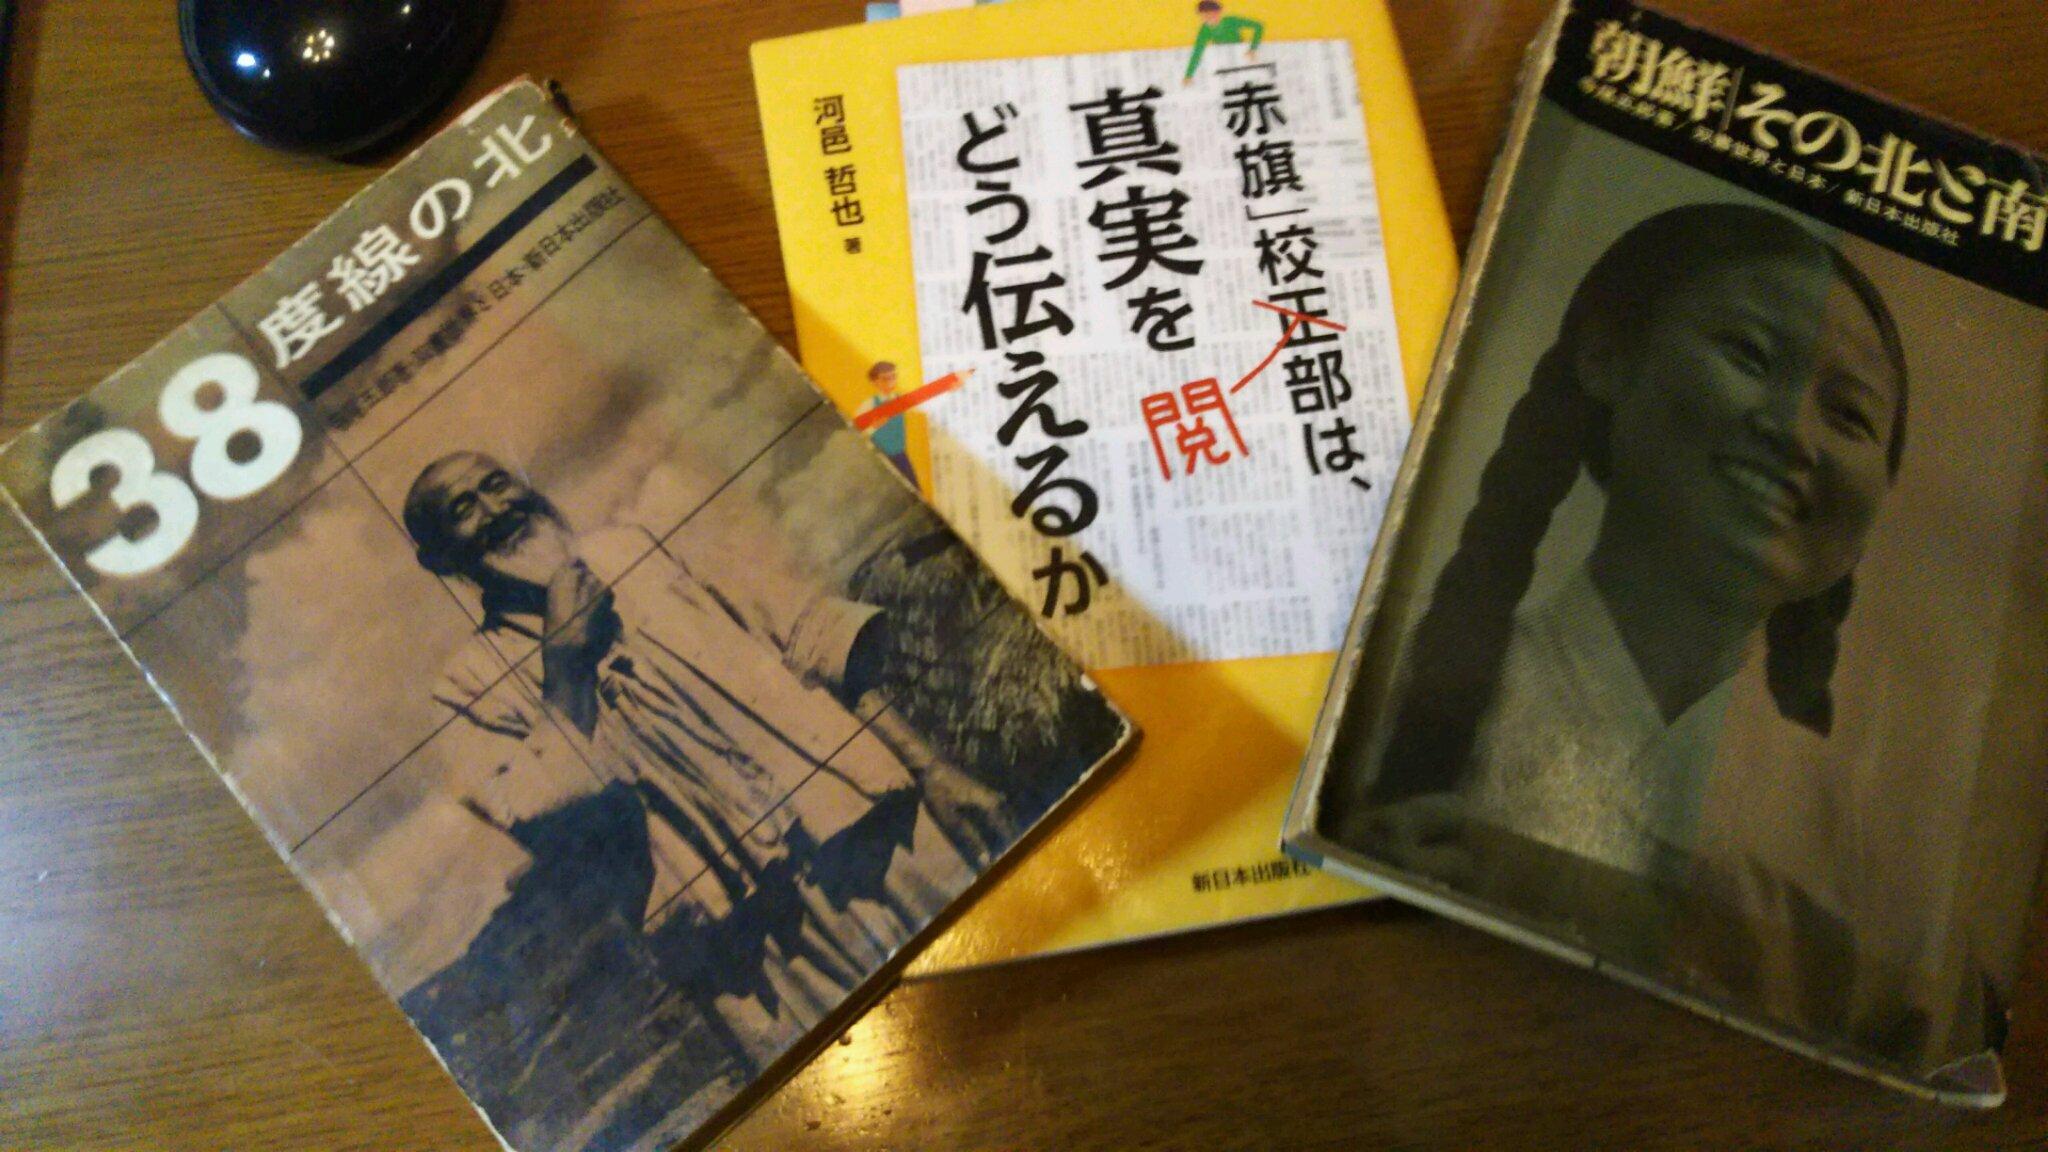 DSC_0230 赤旗校閲部長の本と寺尾五郎の本。